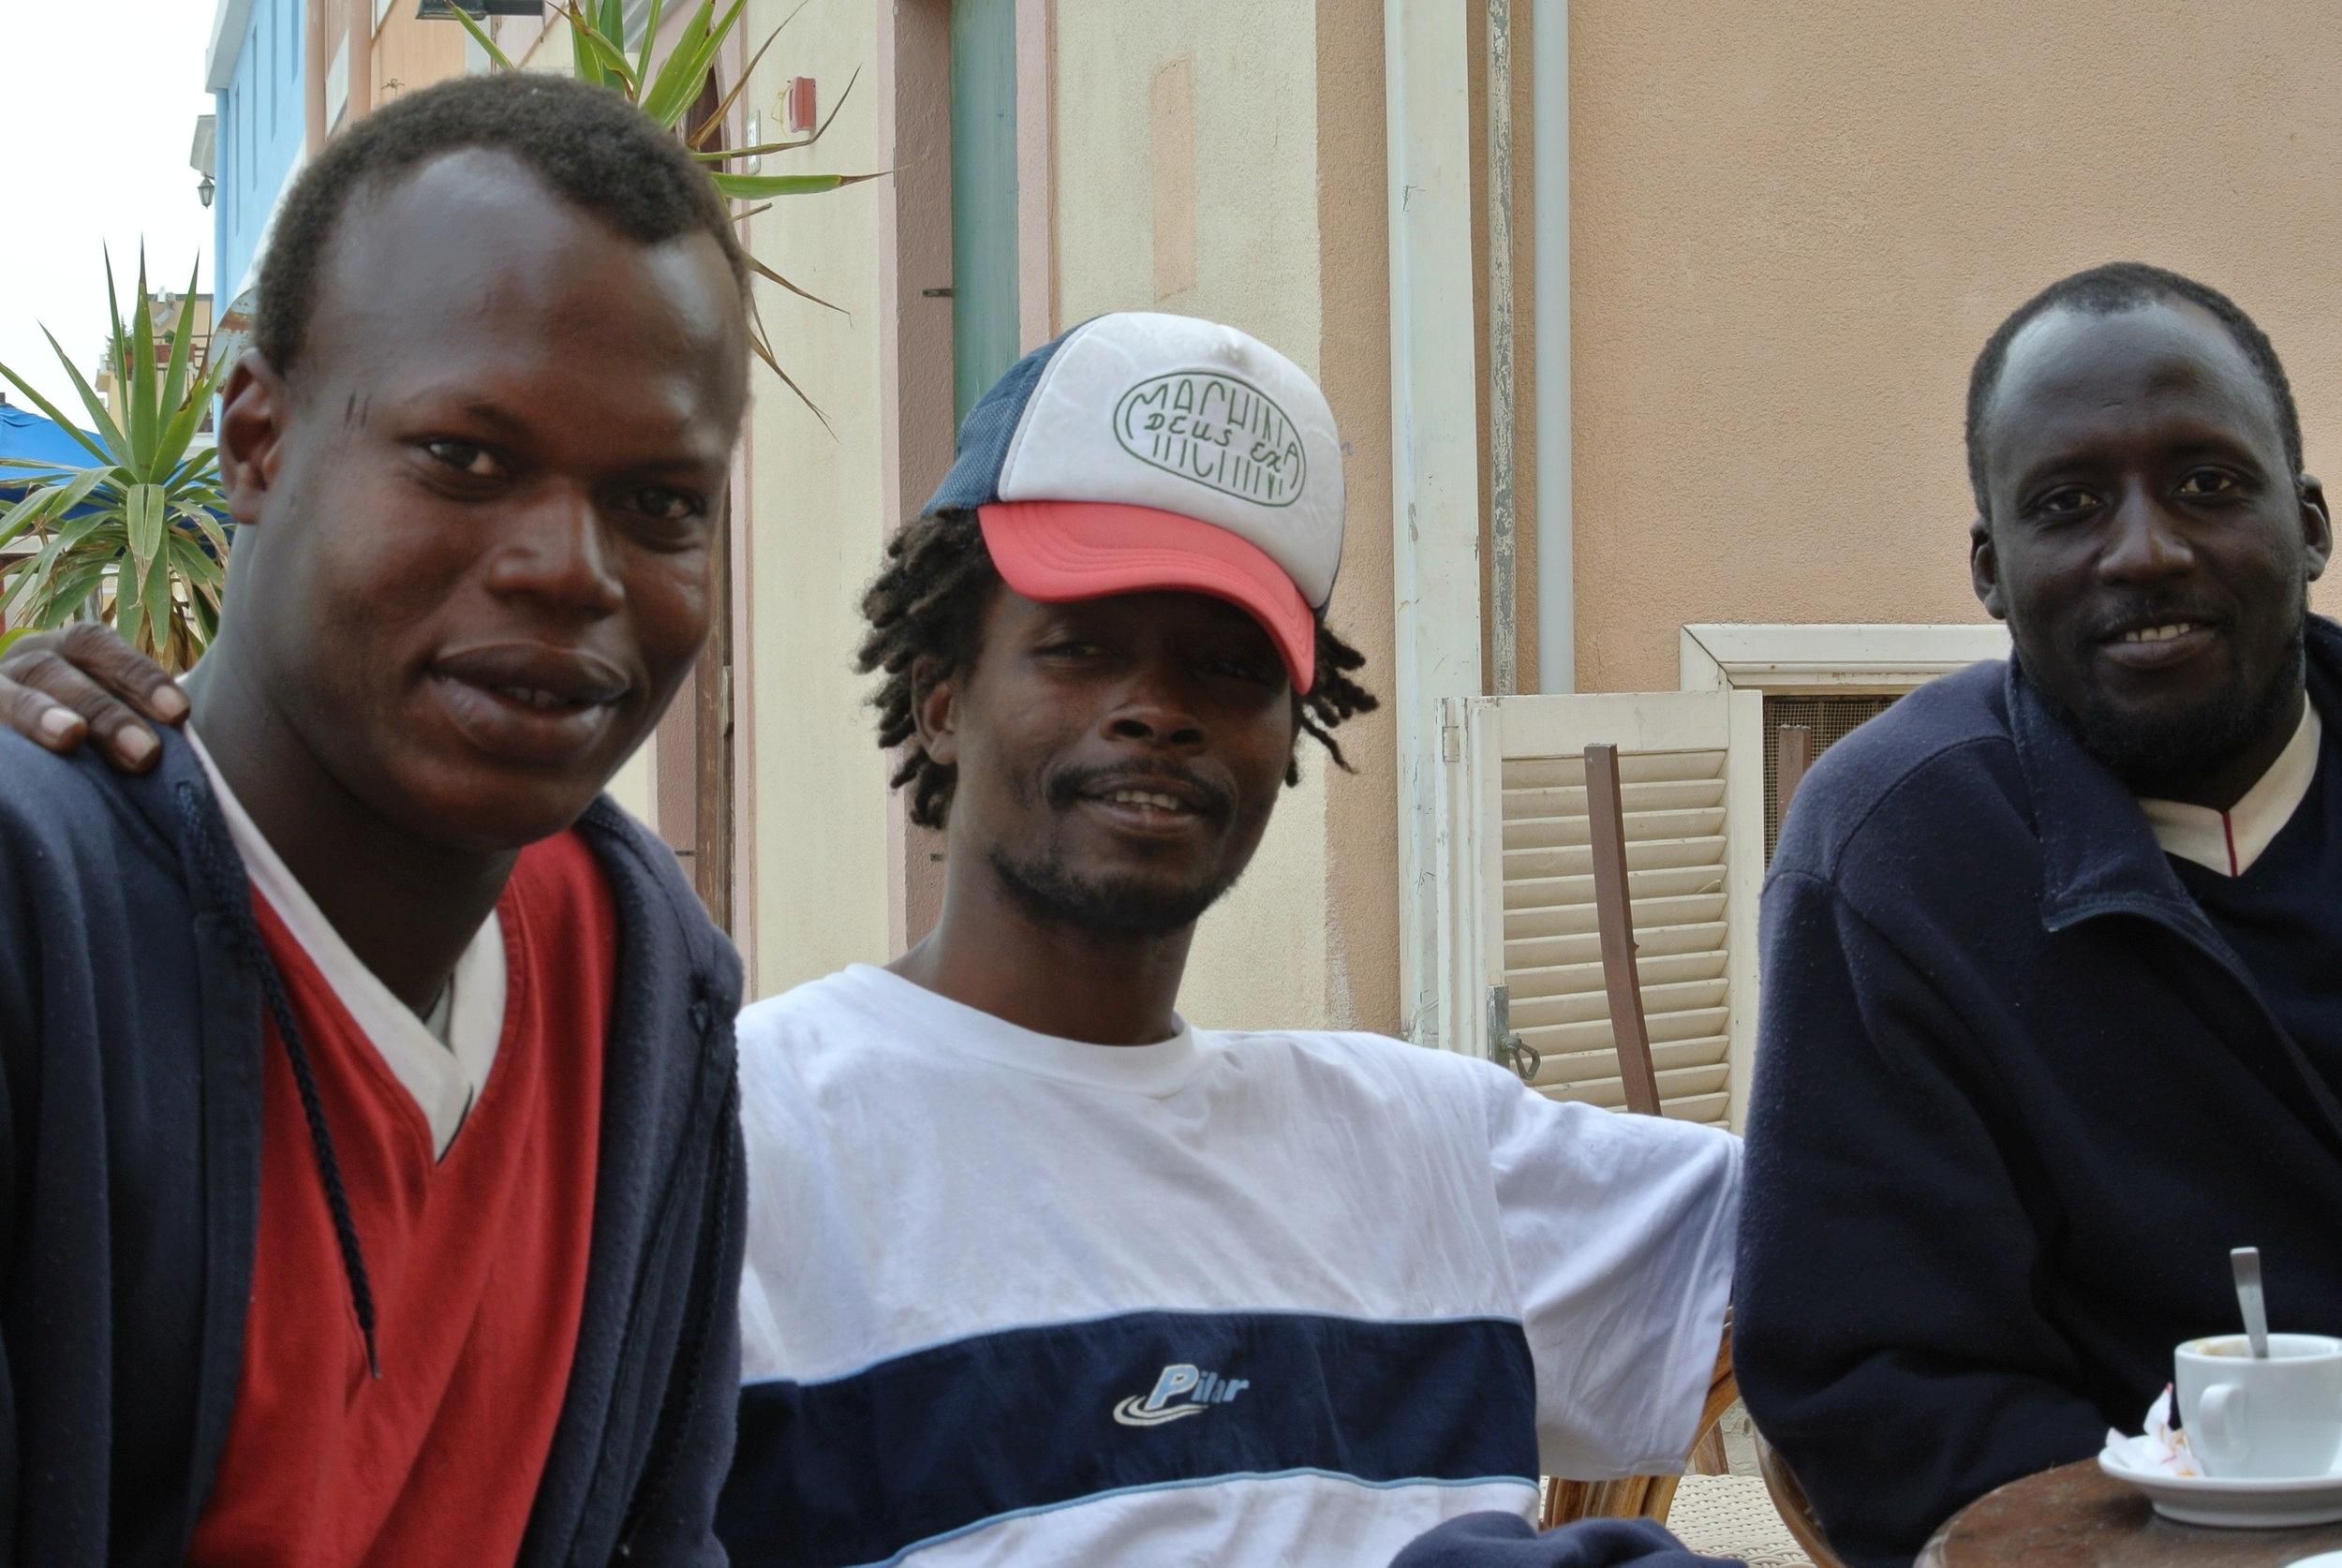 Amici: Yoro, Ousman con il mio cappello e Baboucarr. 28 april 2017; Lampedusa, Italia. ©Pamela Kerpius